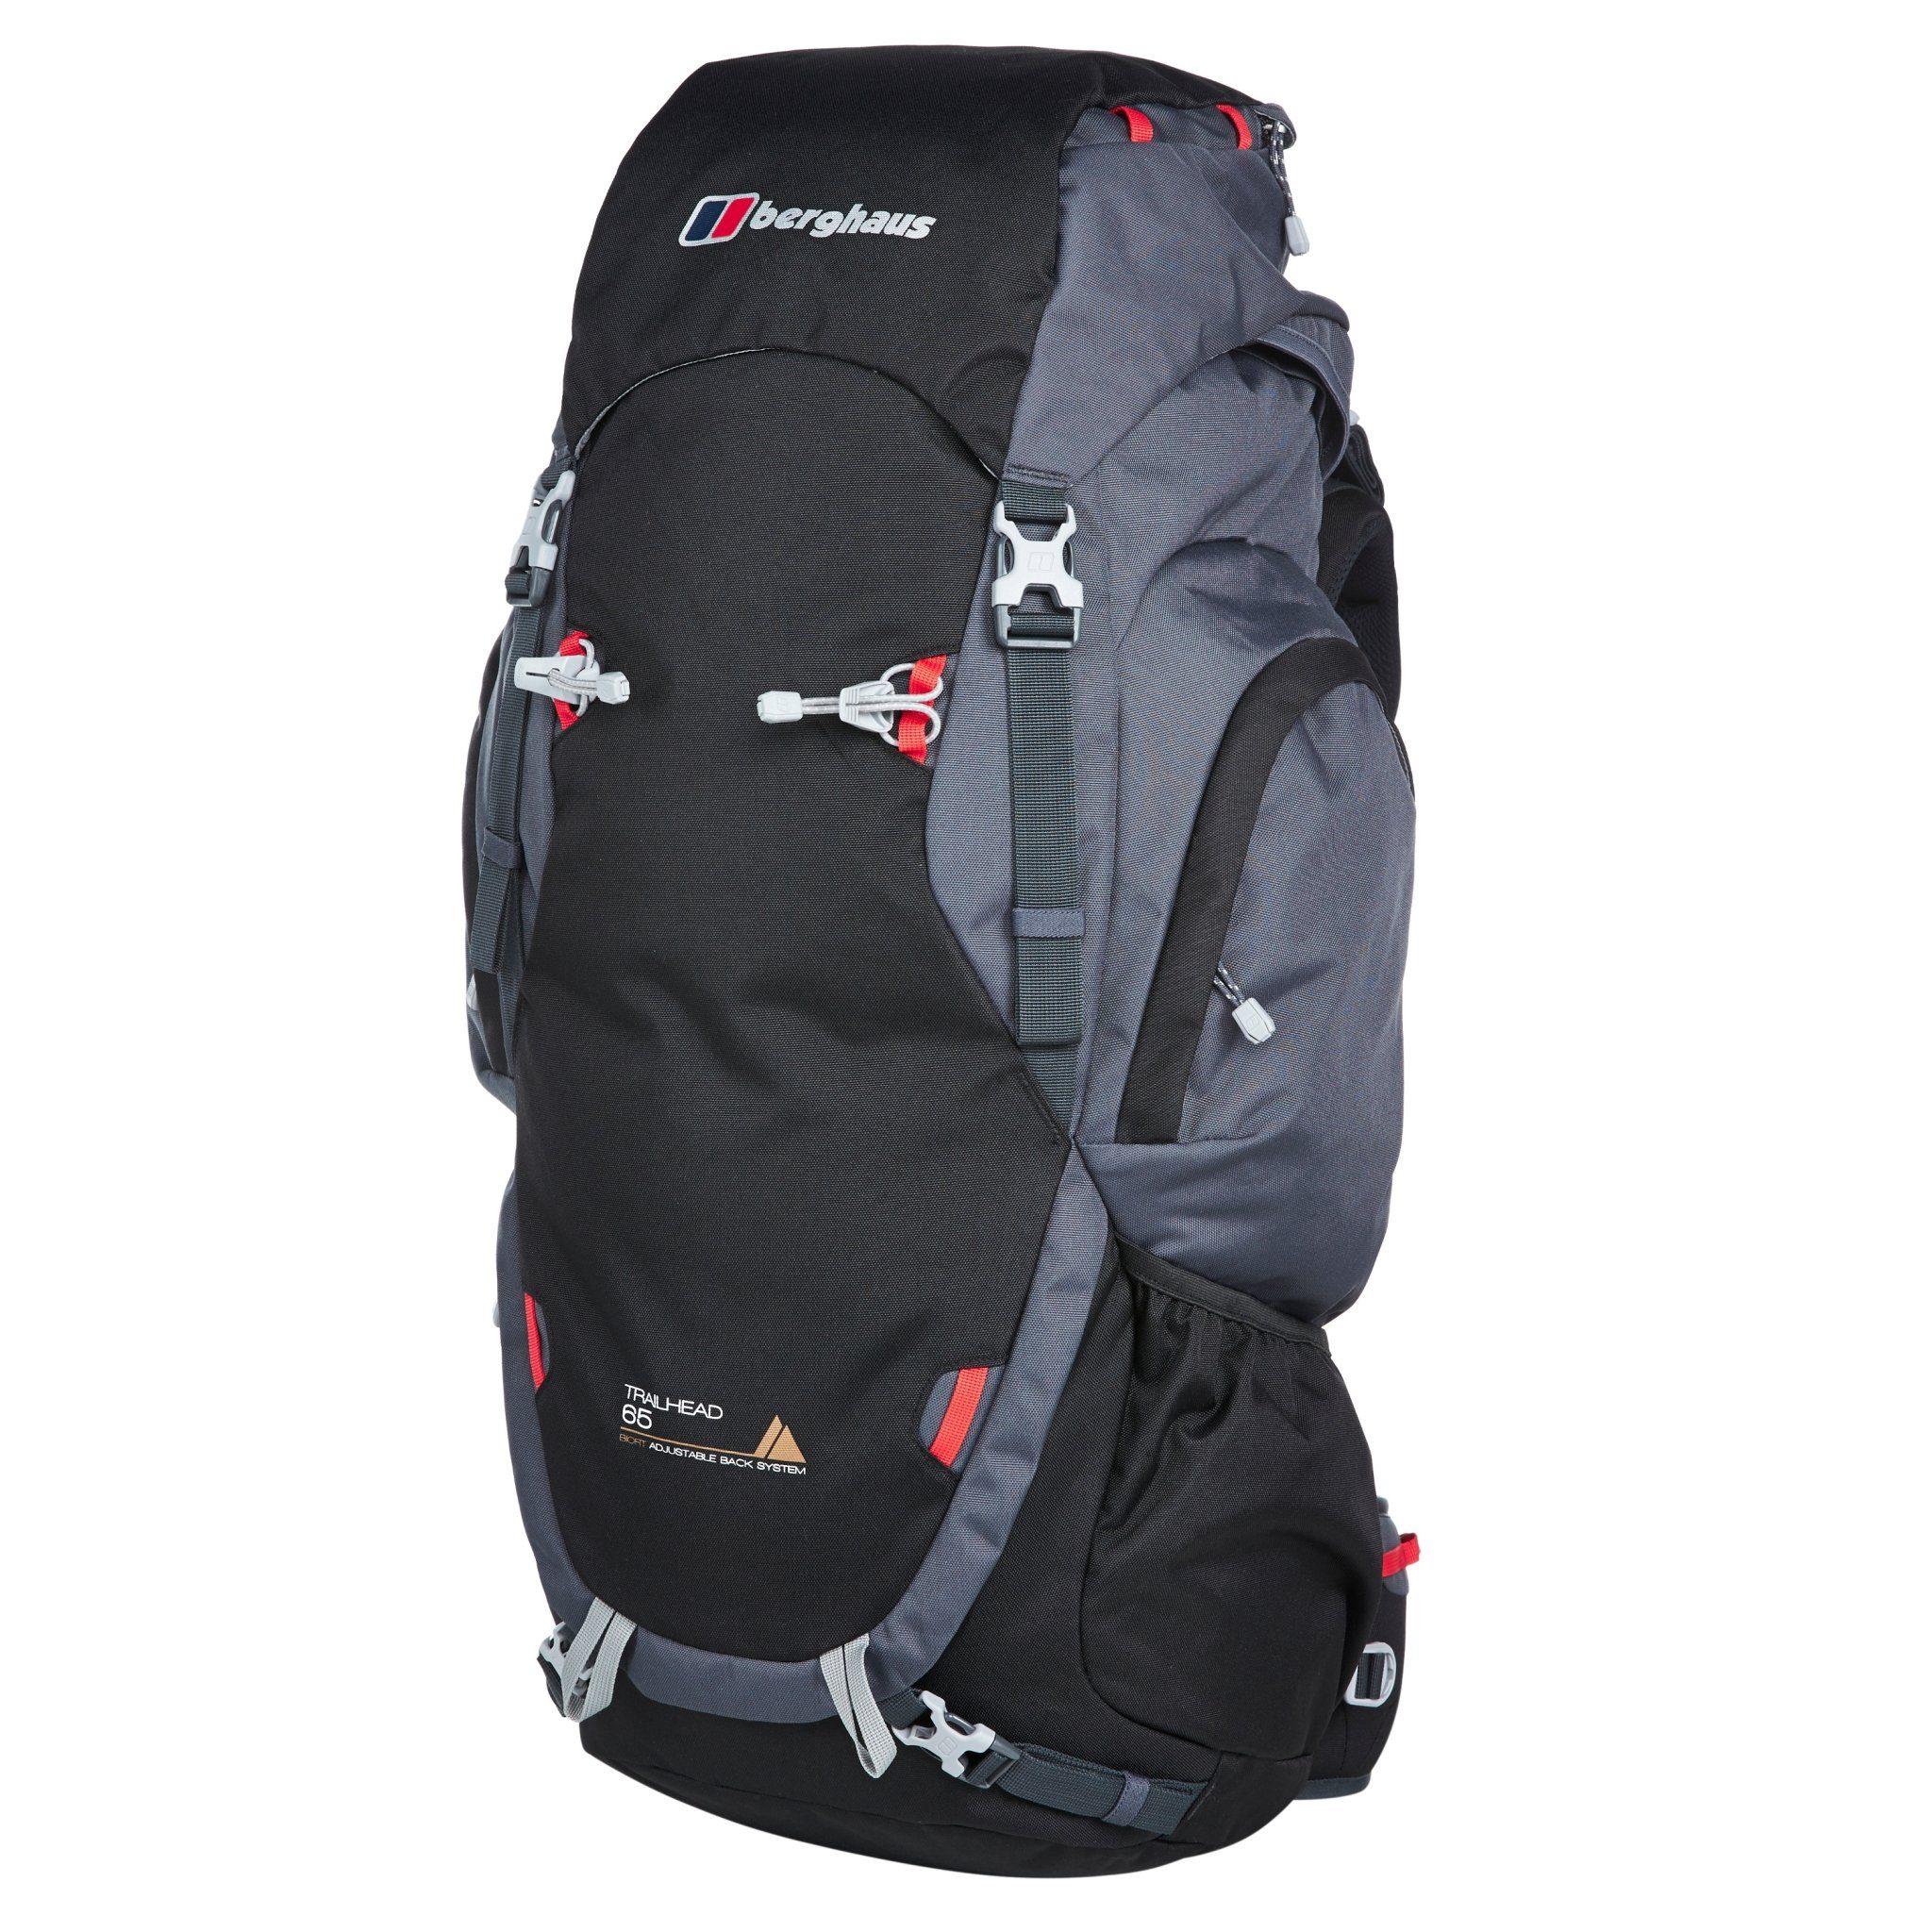 Berghaus Wanderrucksack »Trailhead 65 Backpack«